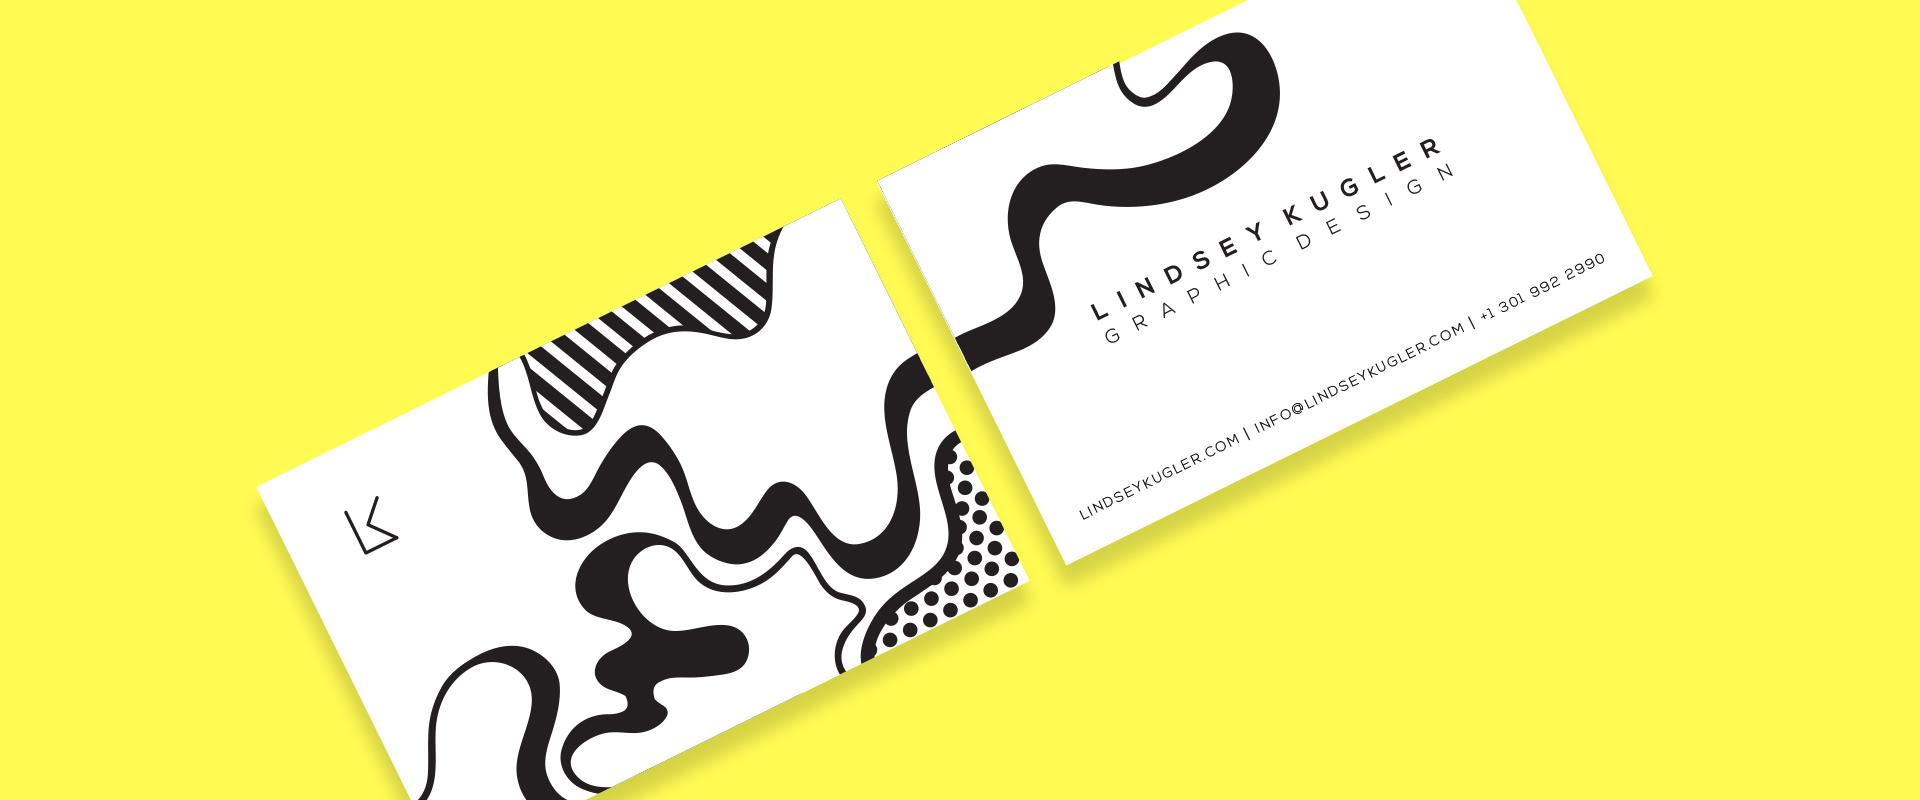 LindseyKuglerGraphicDesign_BusinessCards_08.jpg